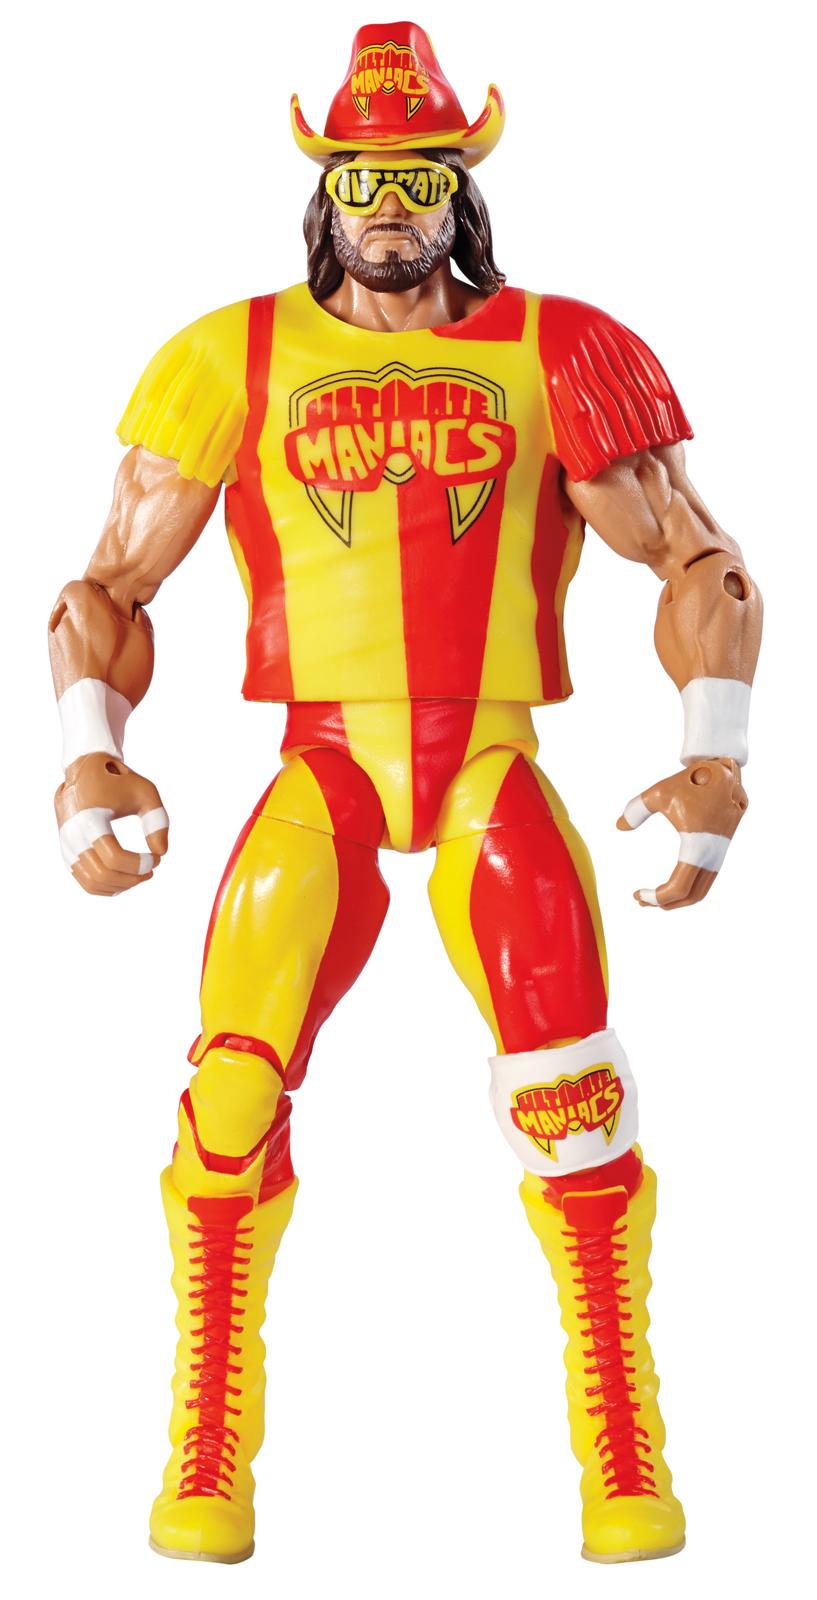 Wwe Macho Man Randy Savage - Elite 44 Toy Wrestling Action